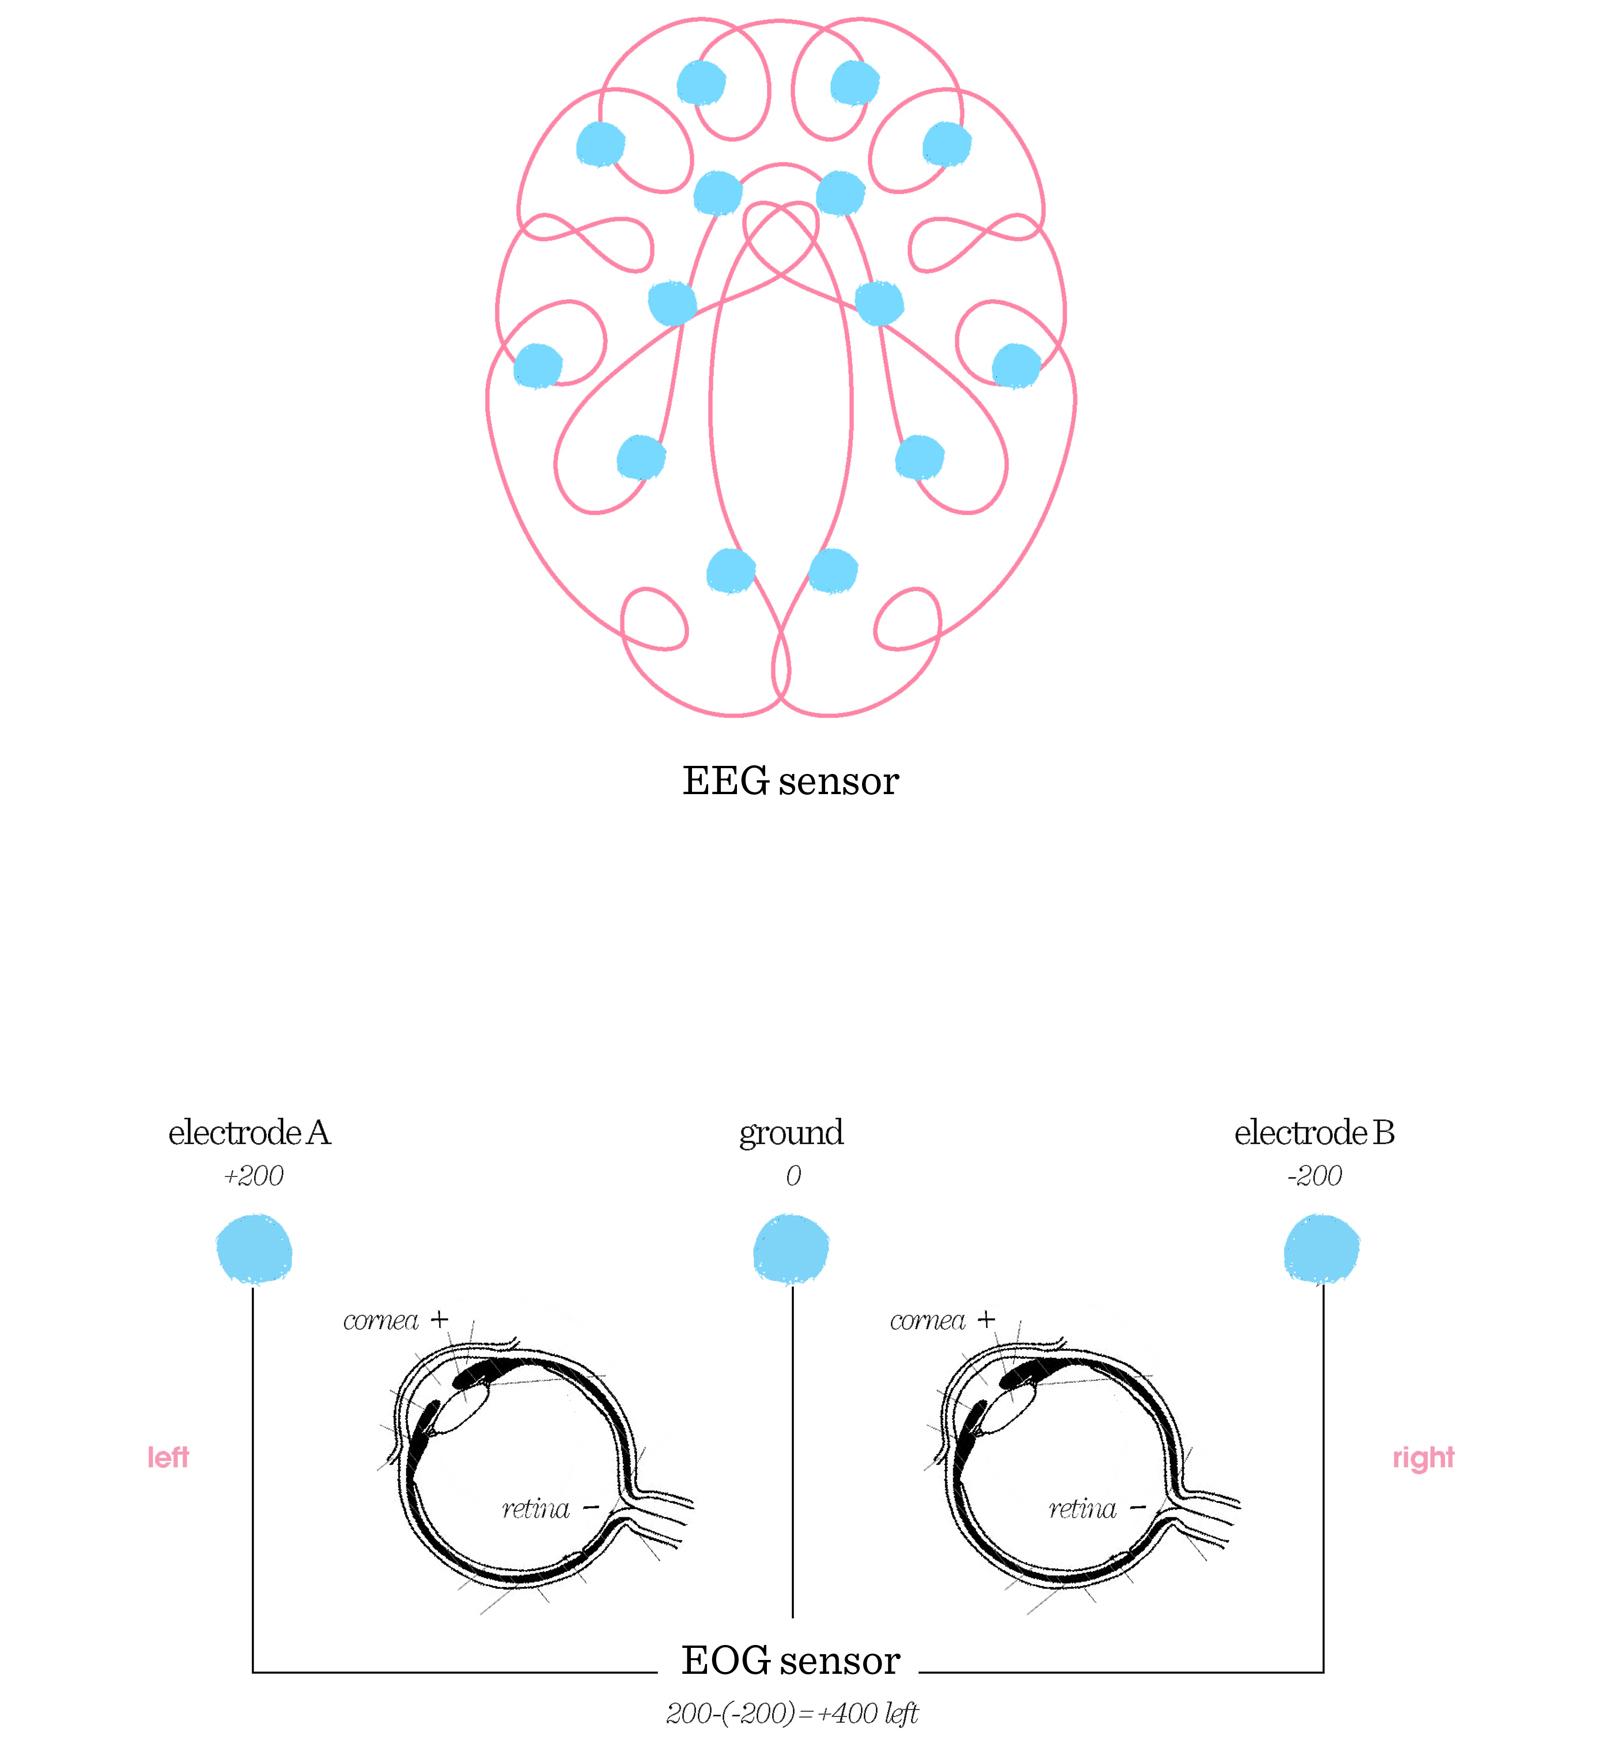 diagram1.jpg